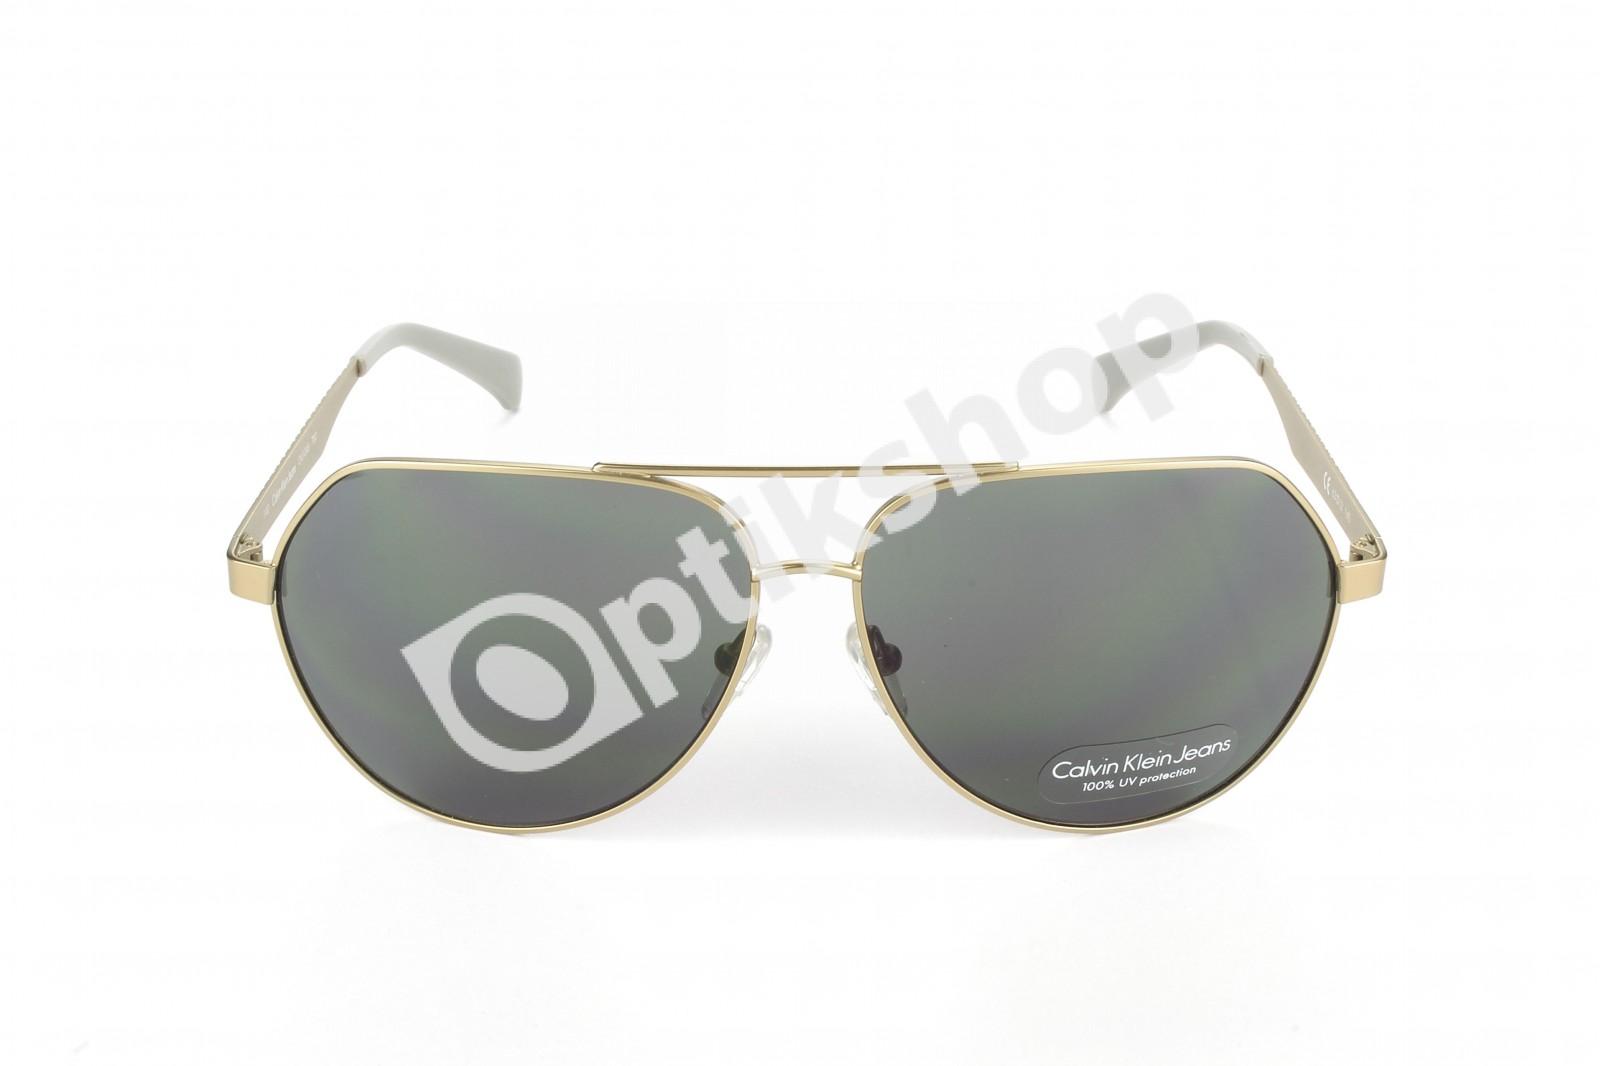 c01fe64f36 Calvin Klein napszemüveg - CKJ104S700